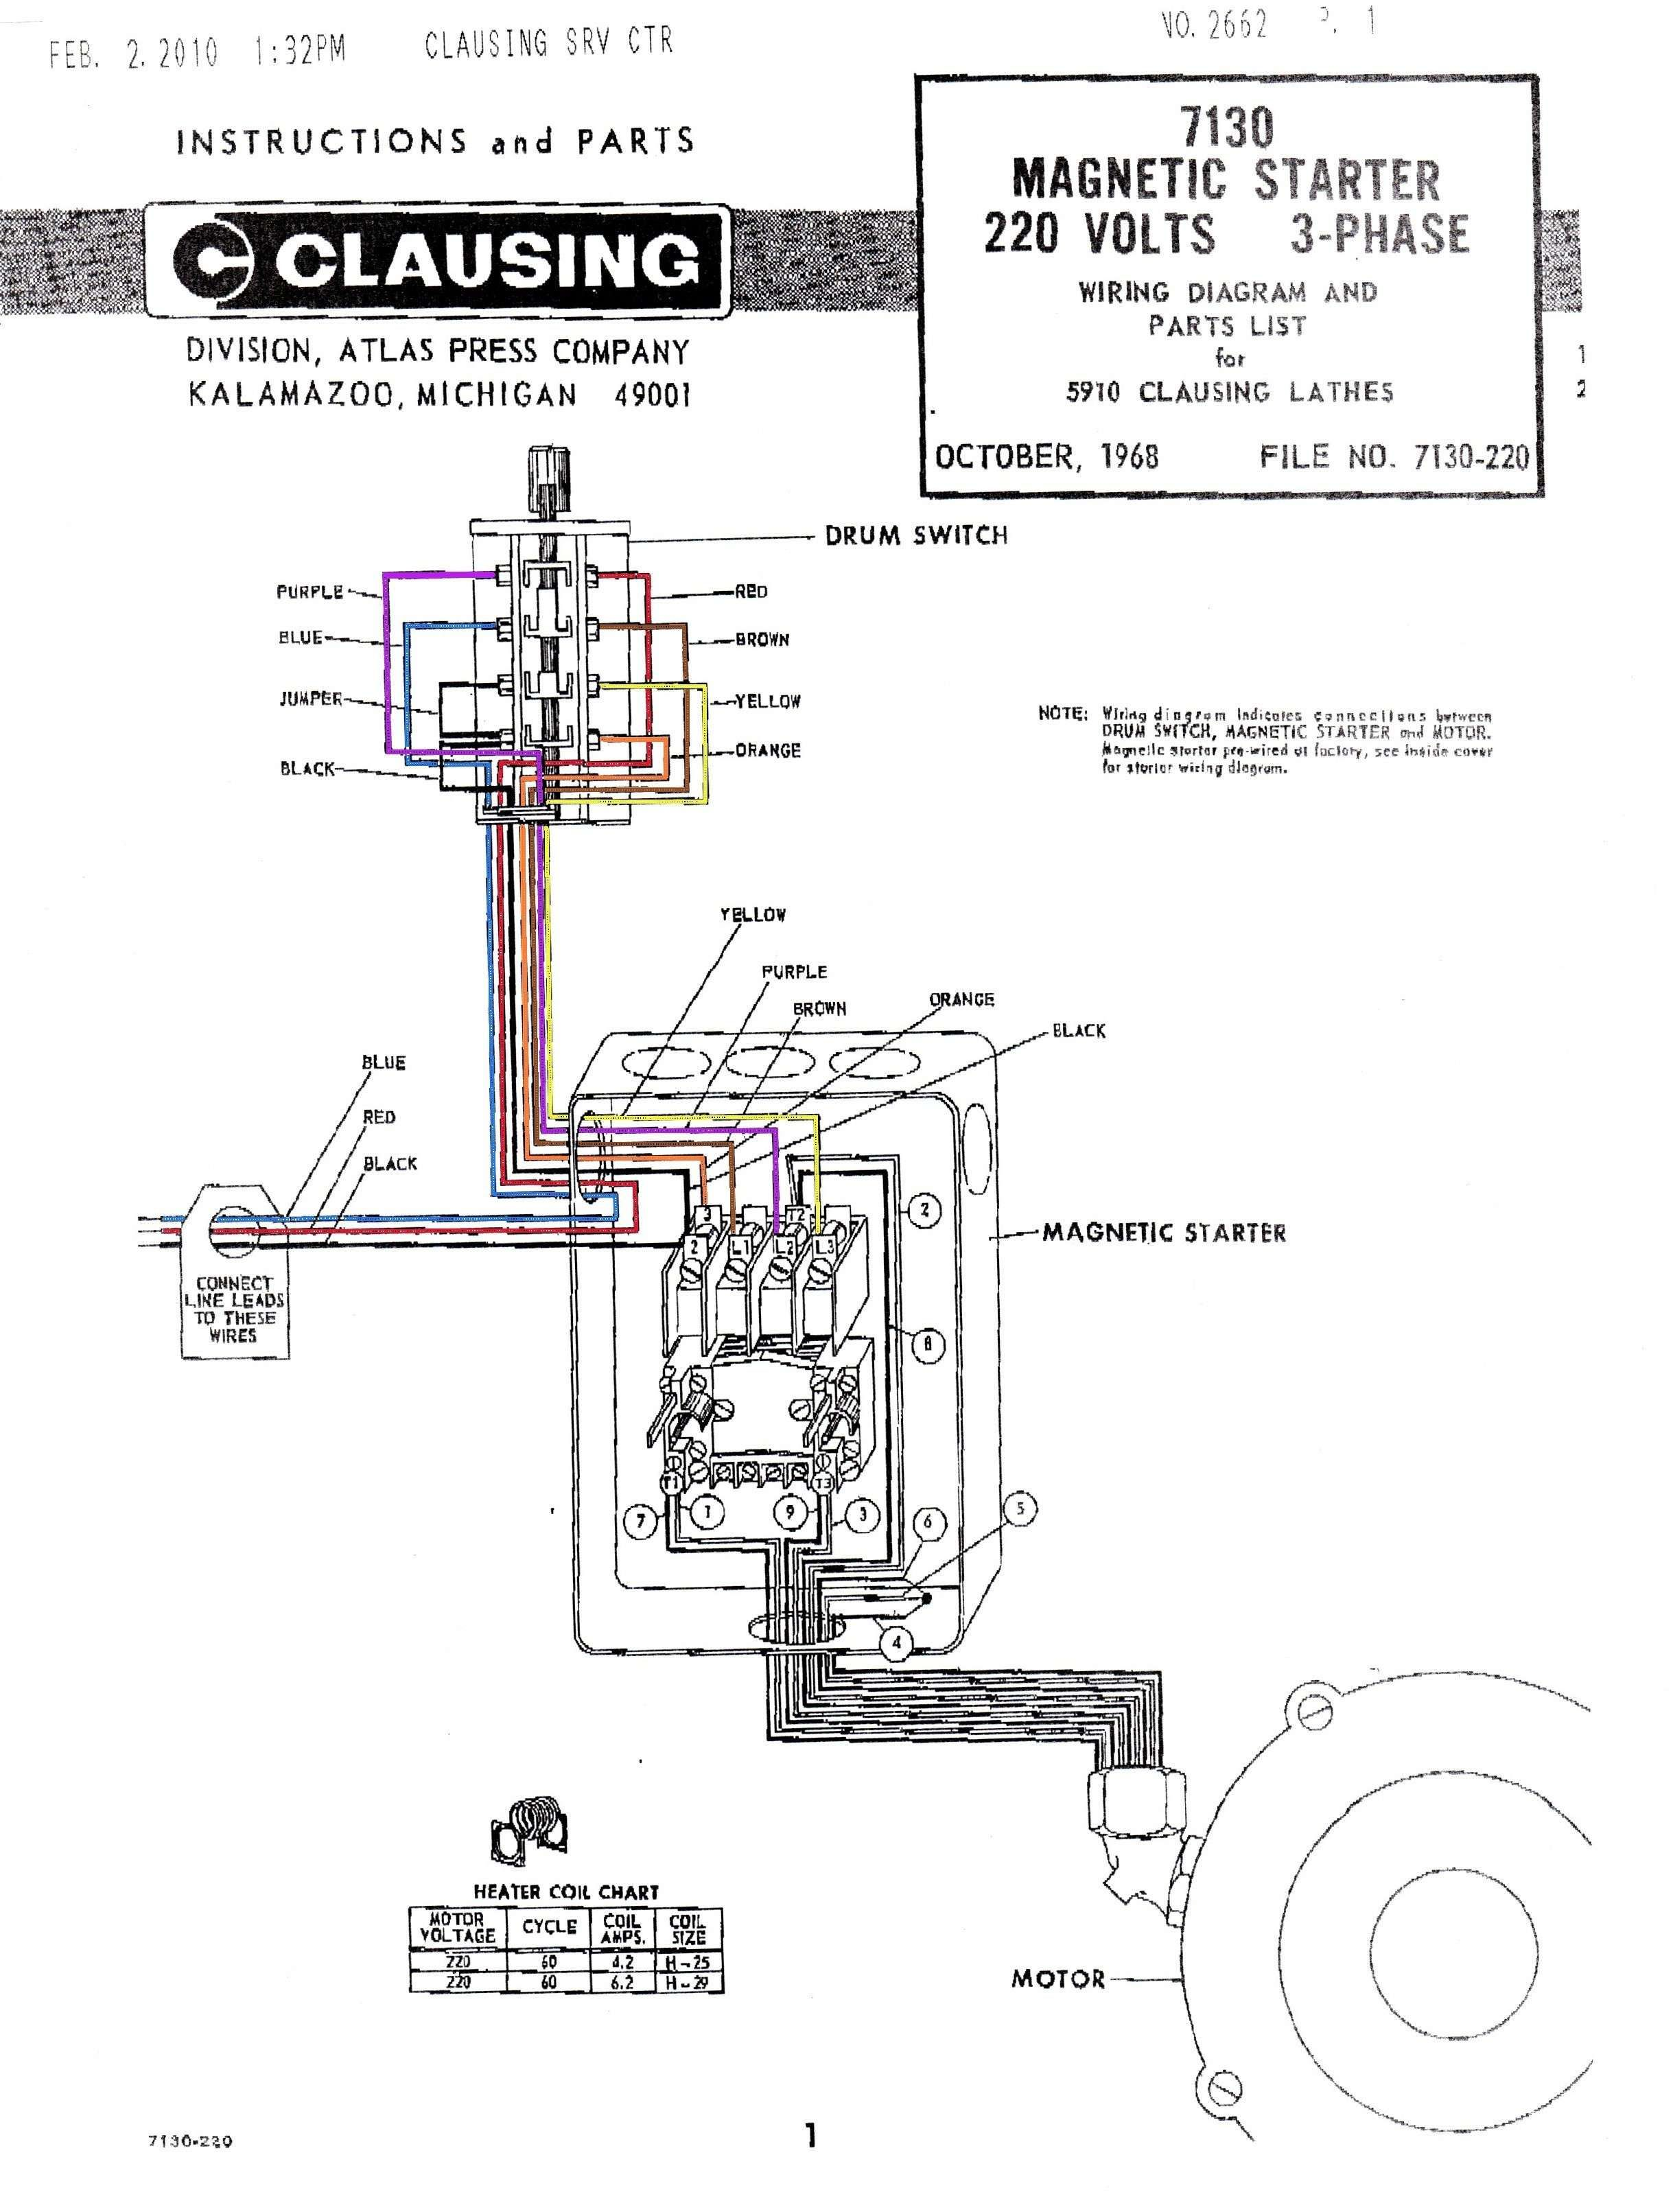 wiring diagram bathroom lovely wiring diagram bathroom bathroom fan light wiring diagram mikulskilawoffices [ 2438 x 3223 Pixel ]